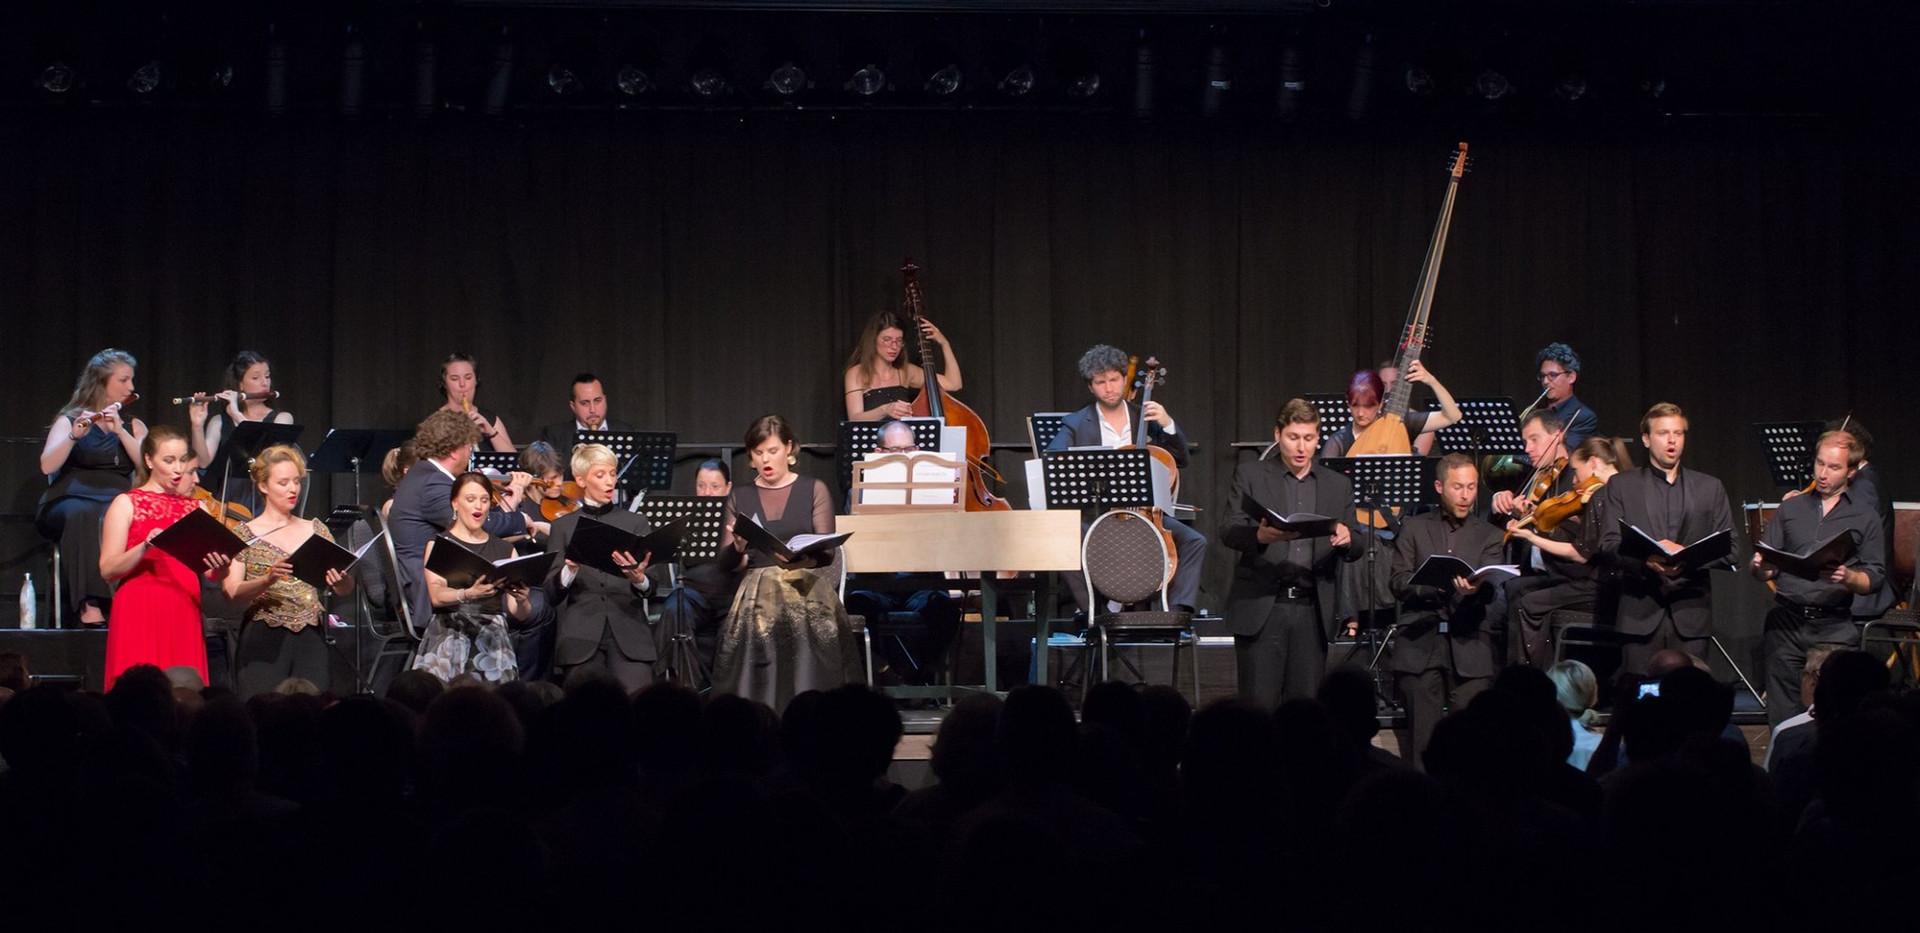 La Folia Barockorchester. Bachfest Leipzig